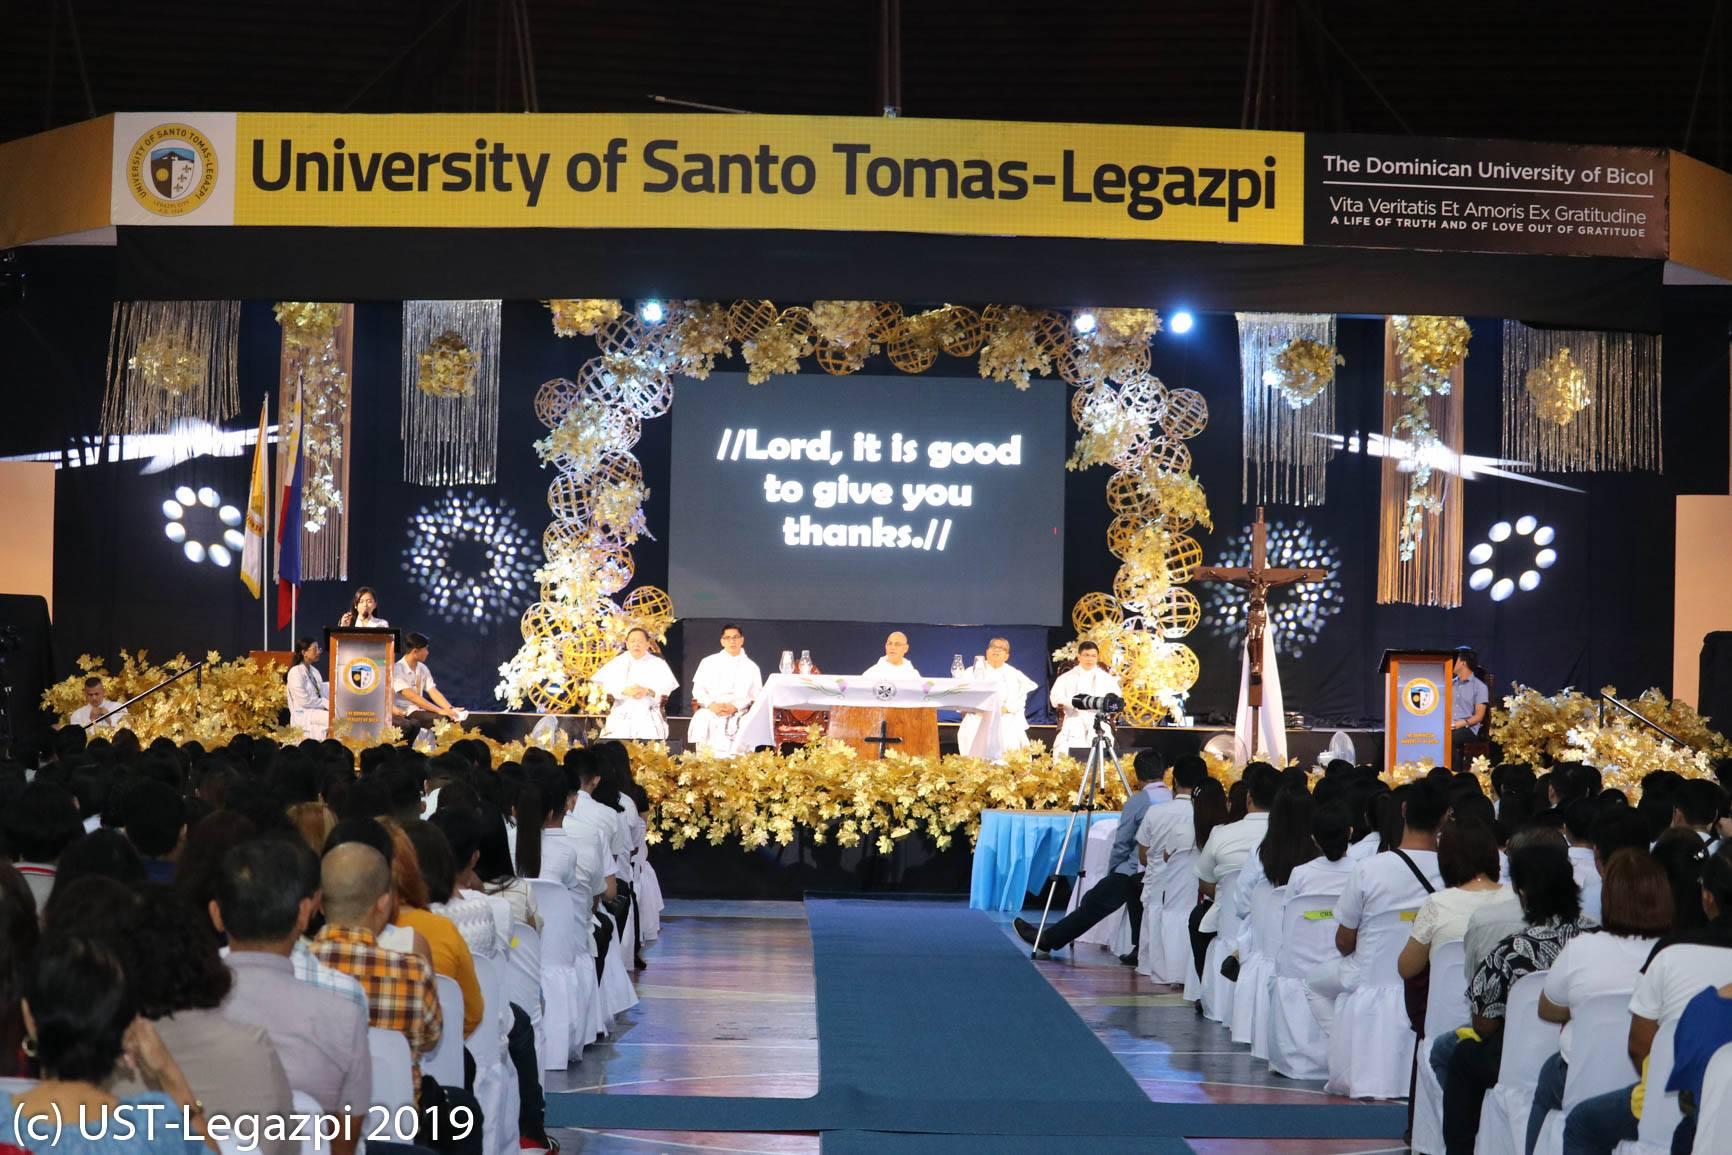 Baccalaureate Mass 2019